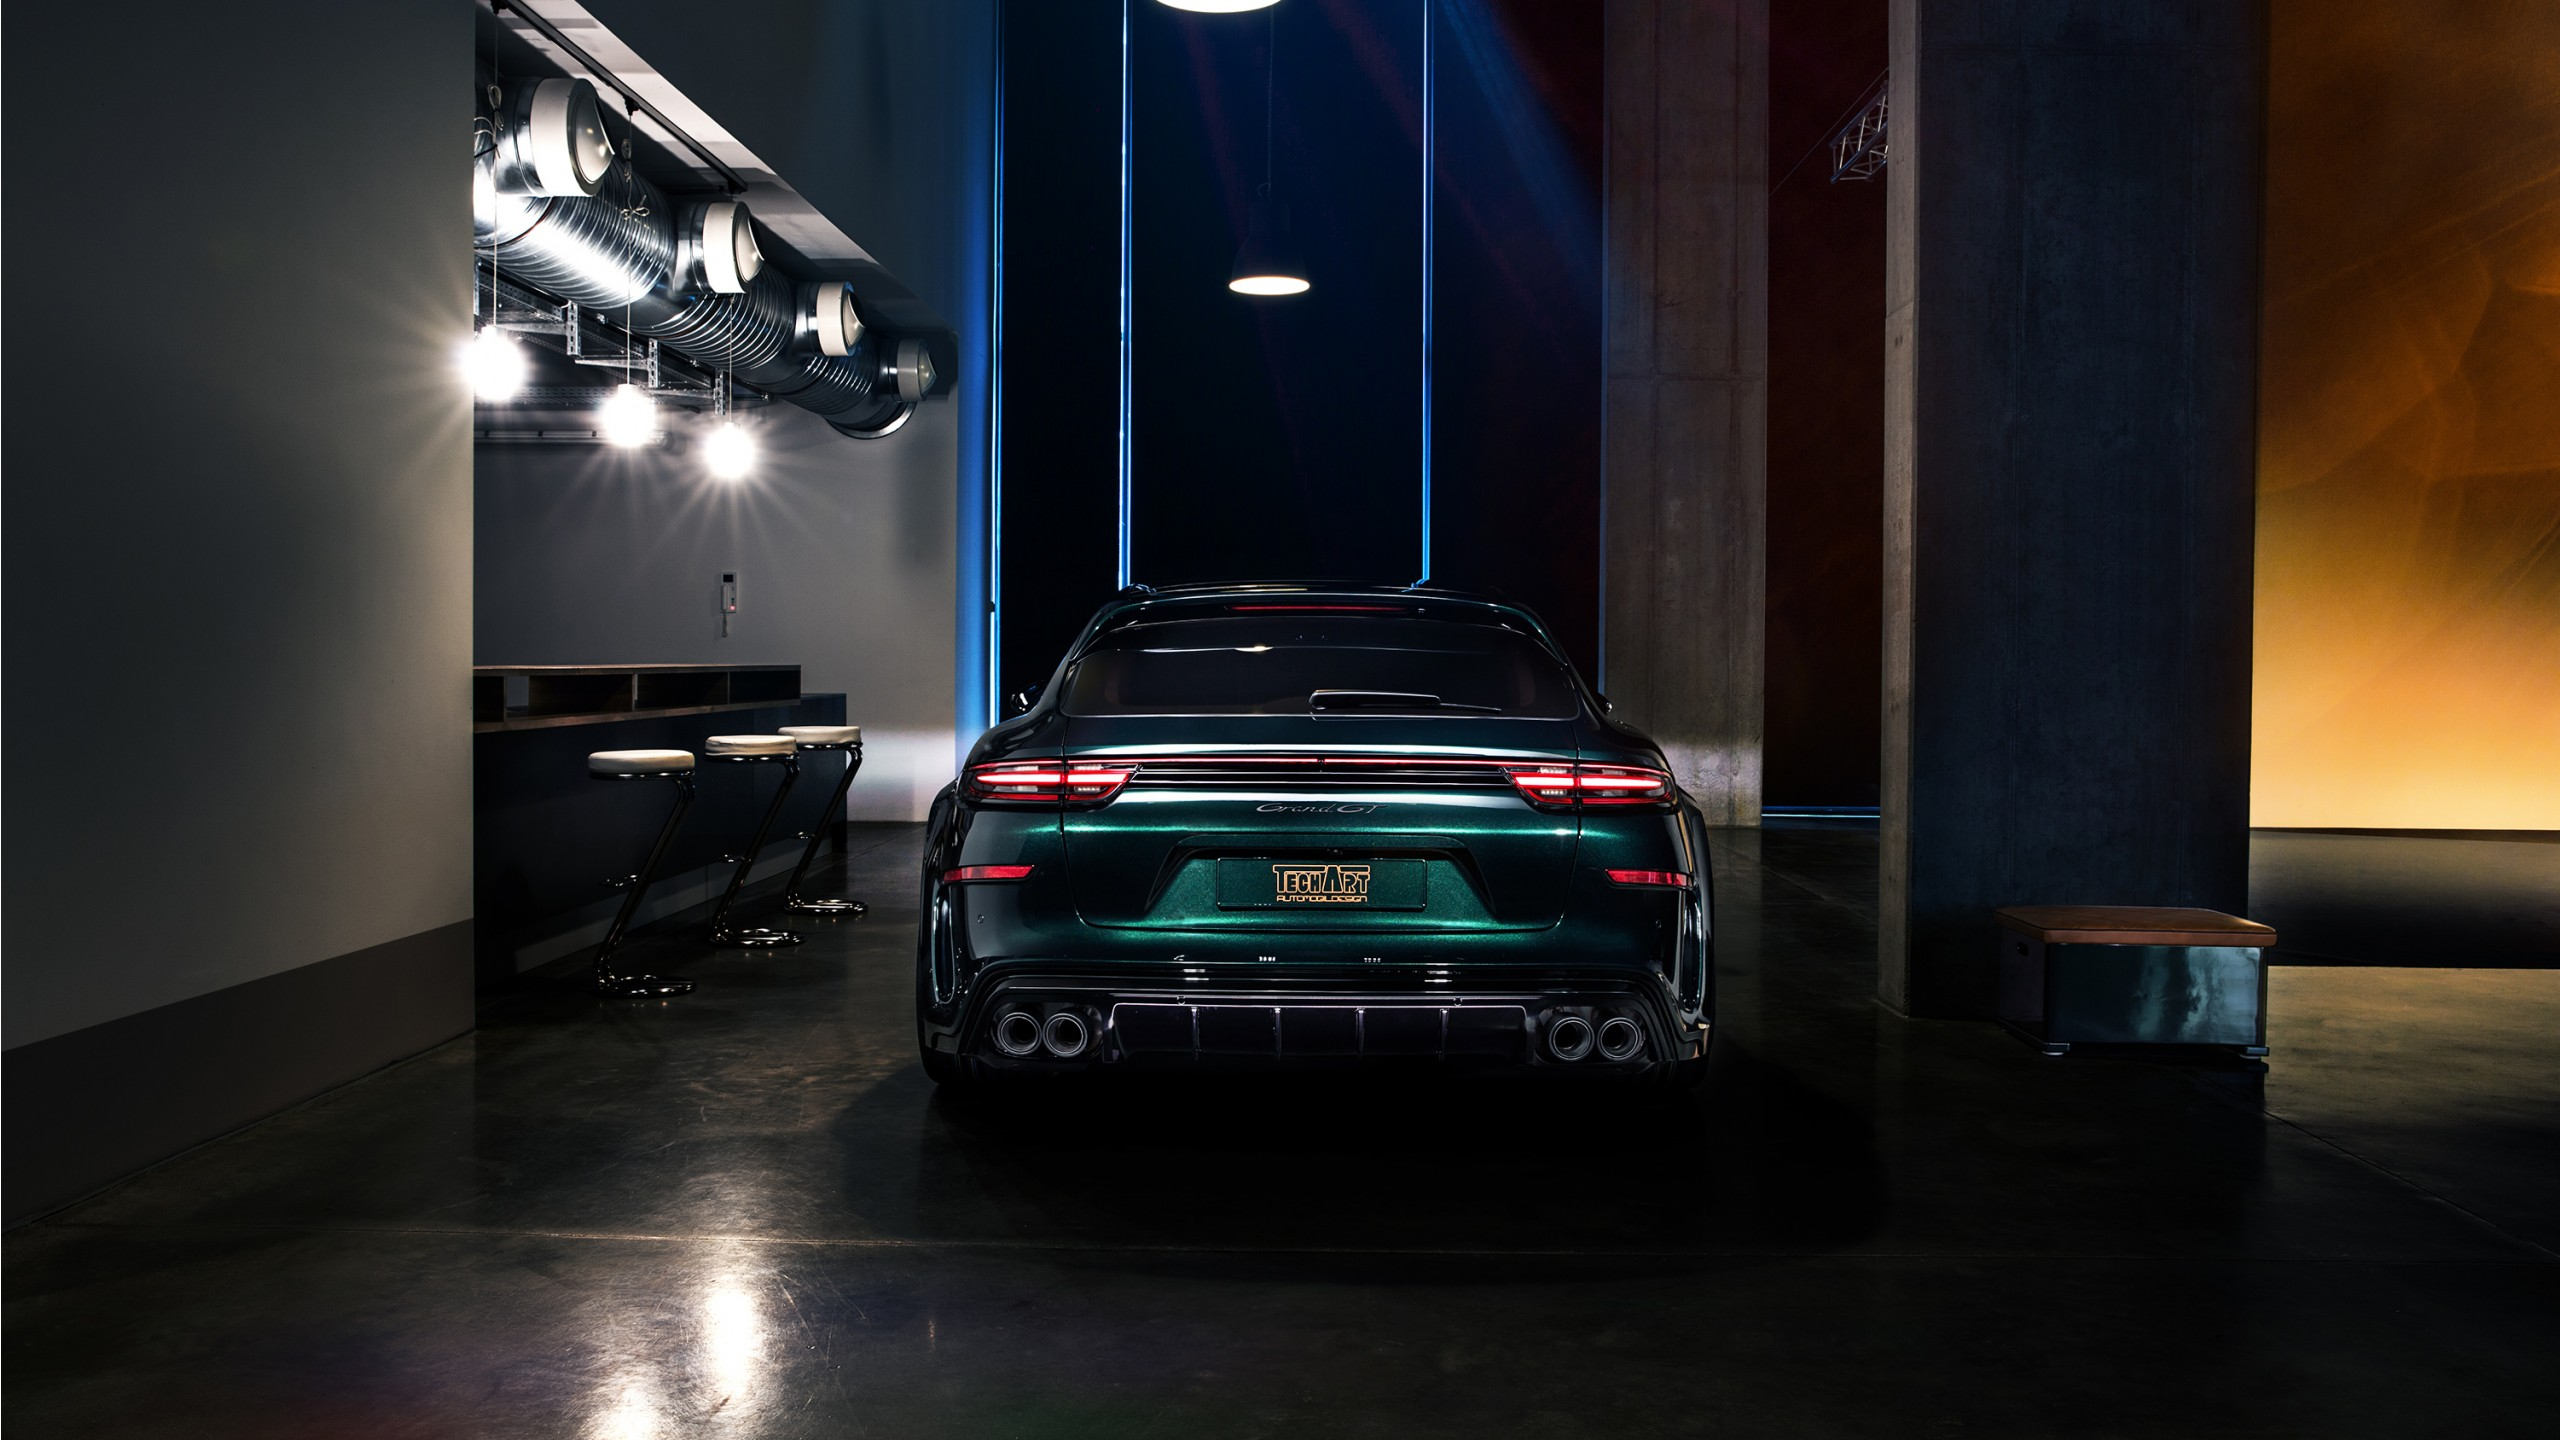 2018 TechArt Porsche Panamera Sport Turismo Grand GT 5 ...